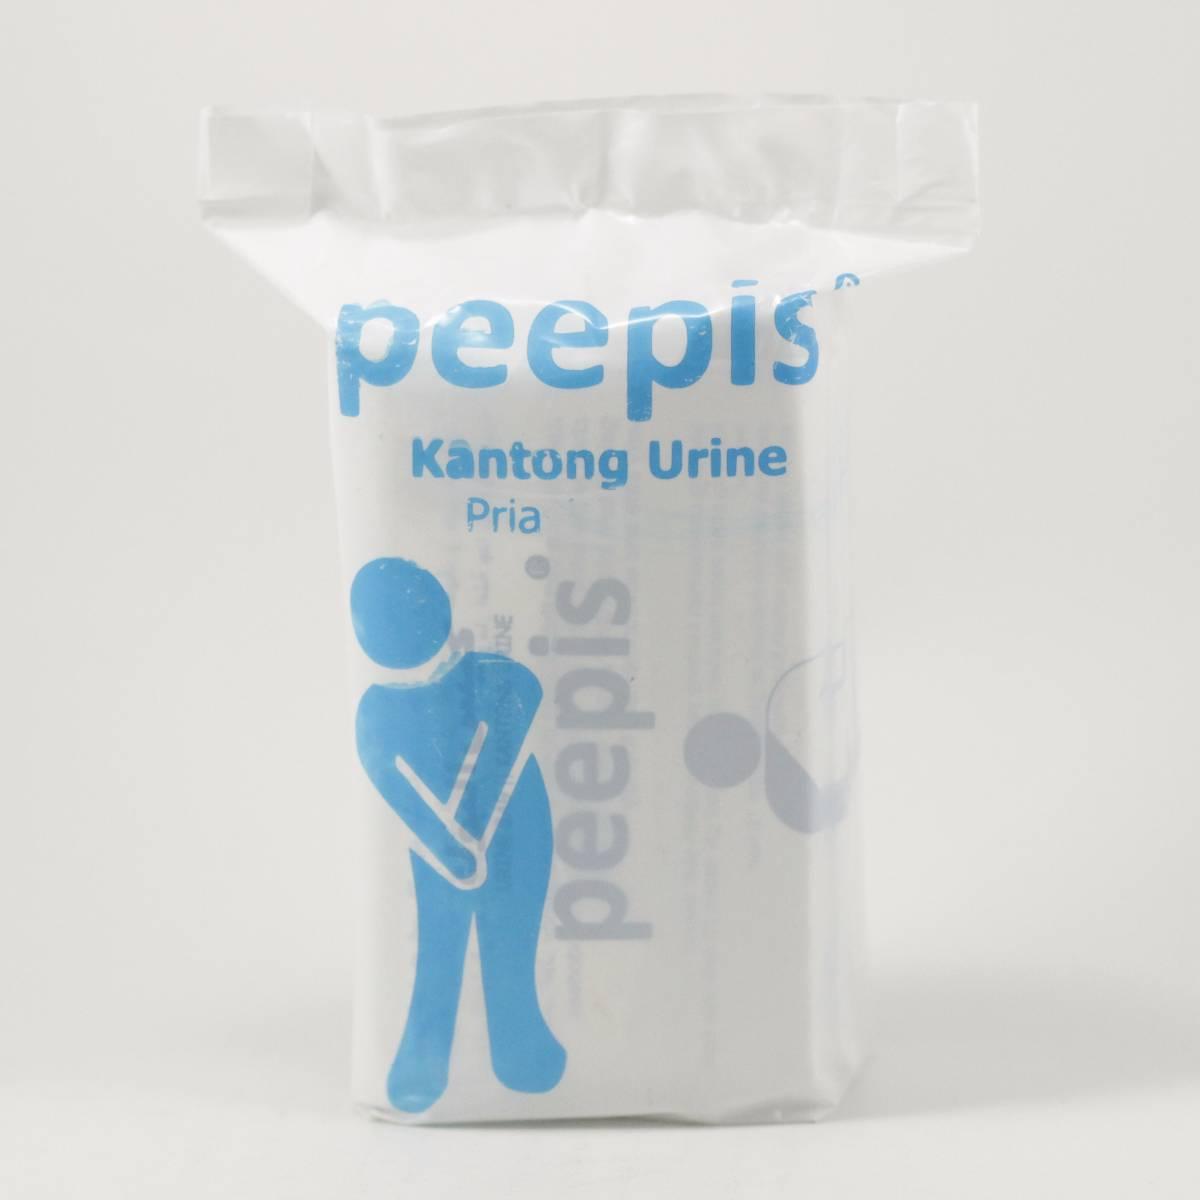 Pee & Pee Urine Bag For Unisex, Men And Women1